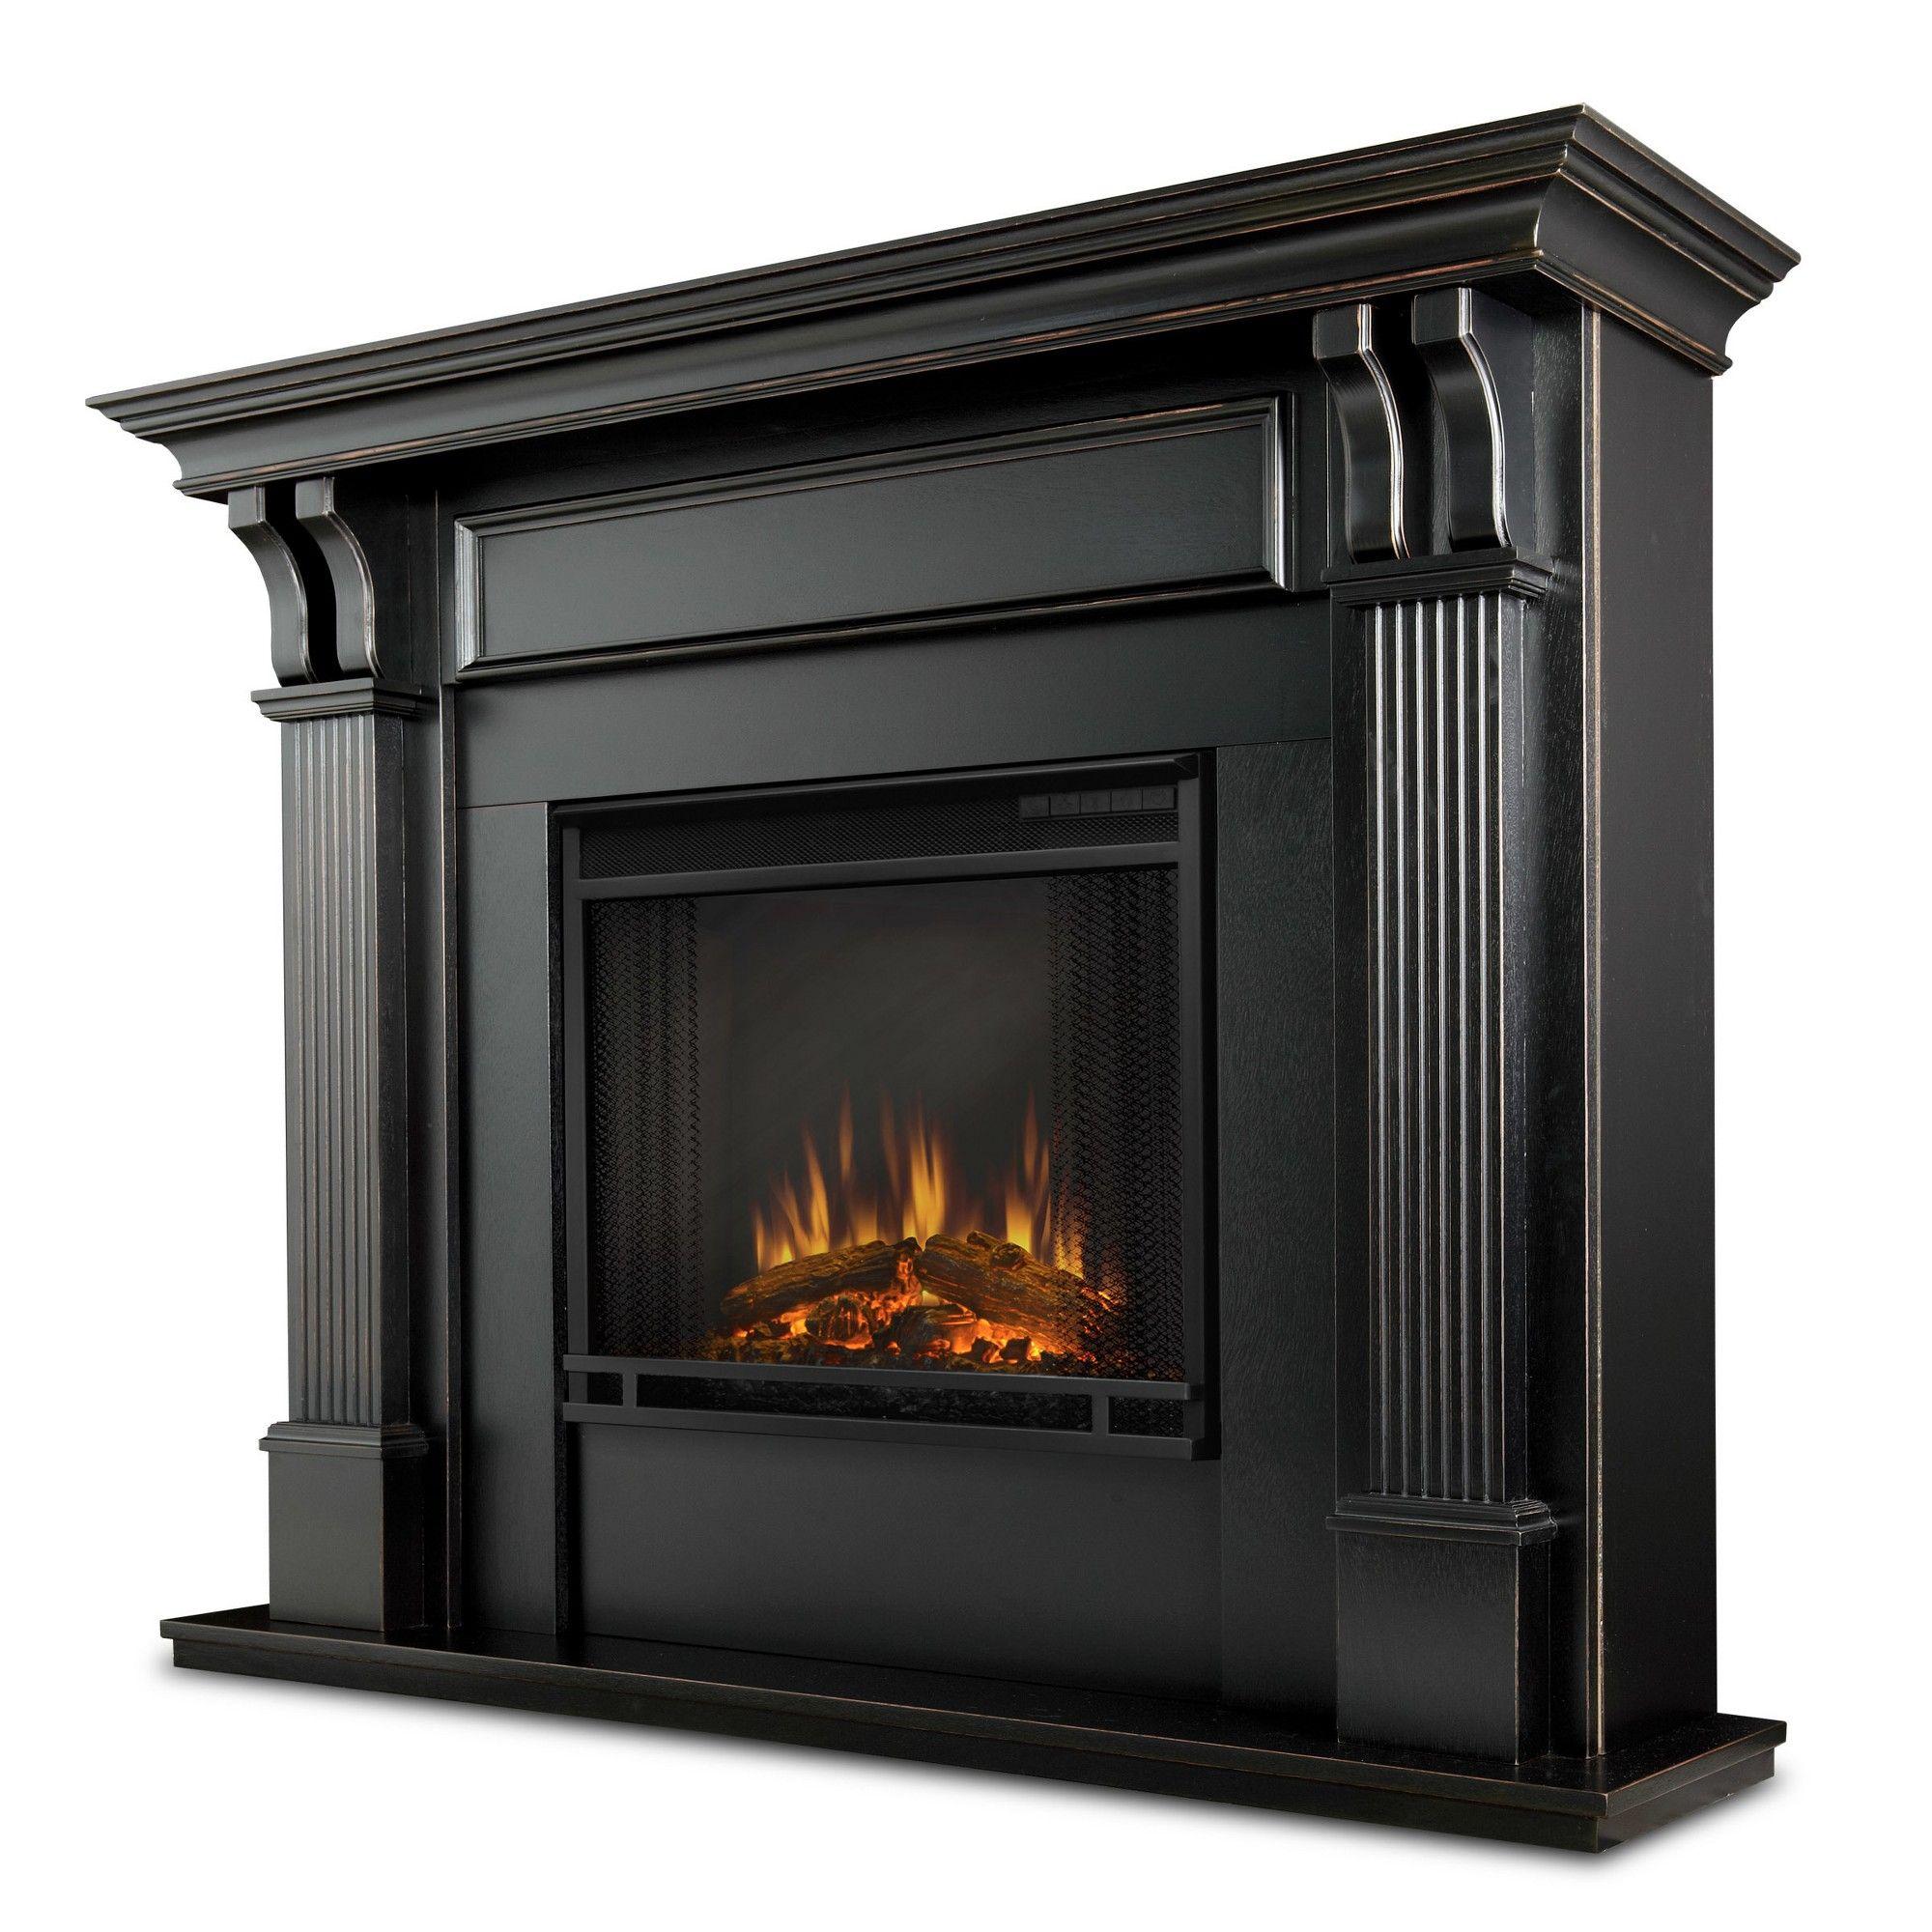 Real Flame Ashley Electric Fireplace Blackwash Blackwash Indoor Electric Fireplace Black Electric Fireplace Portable Fireplace